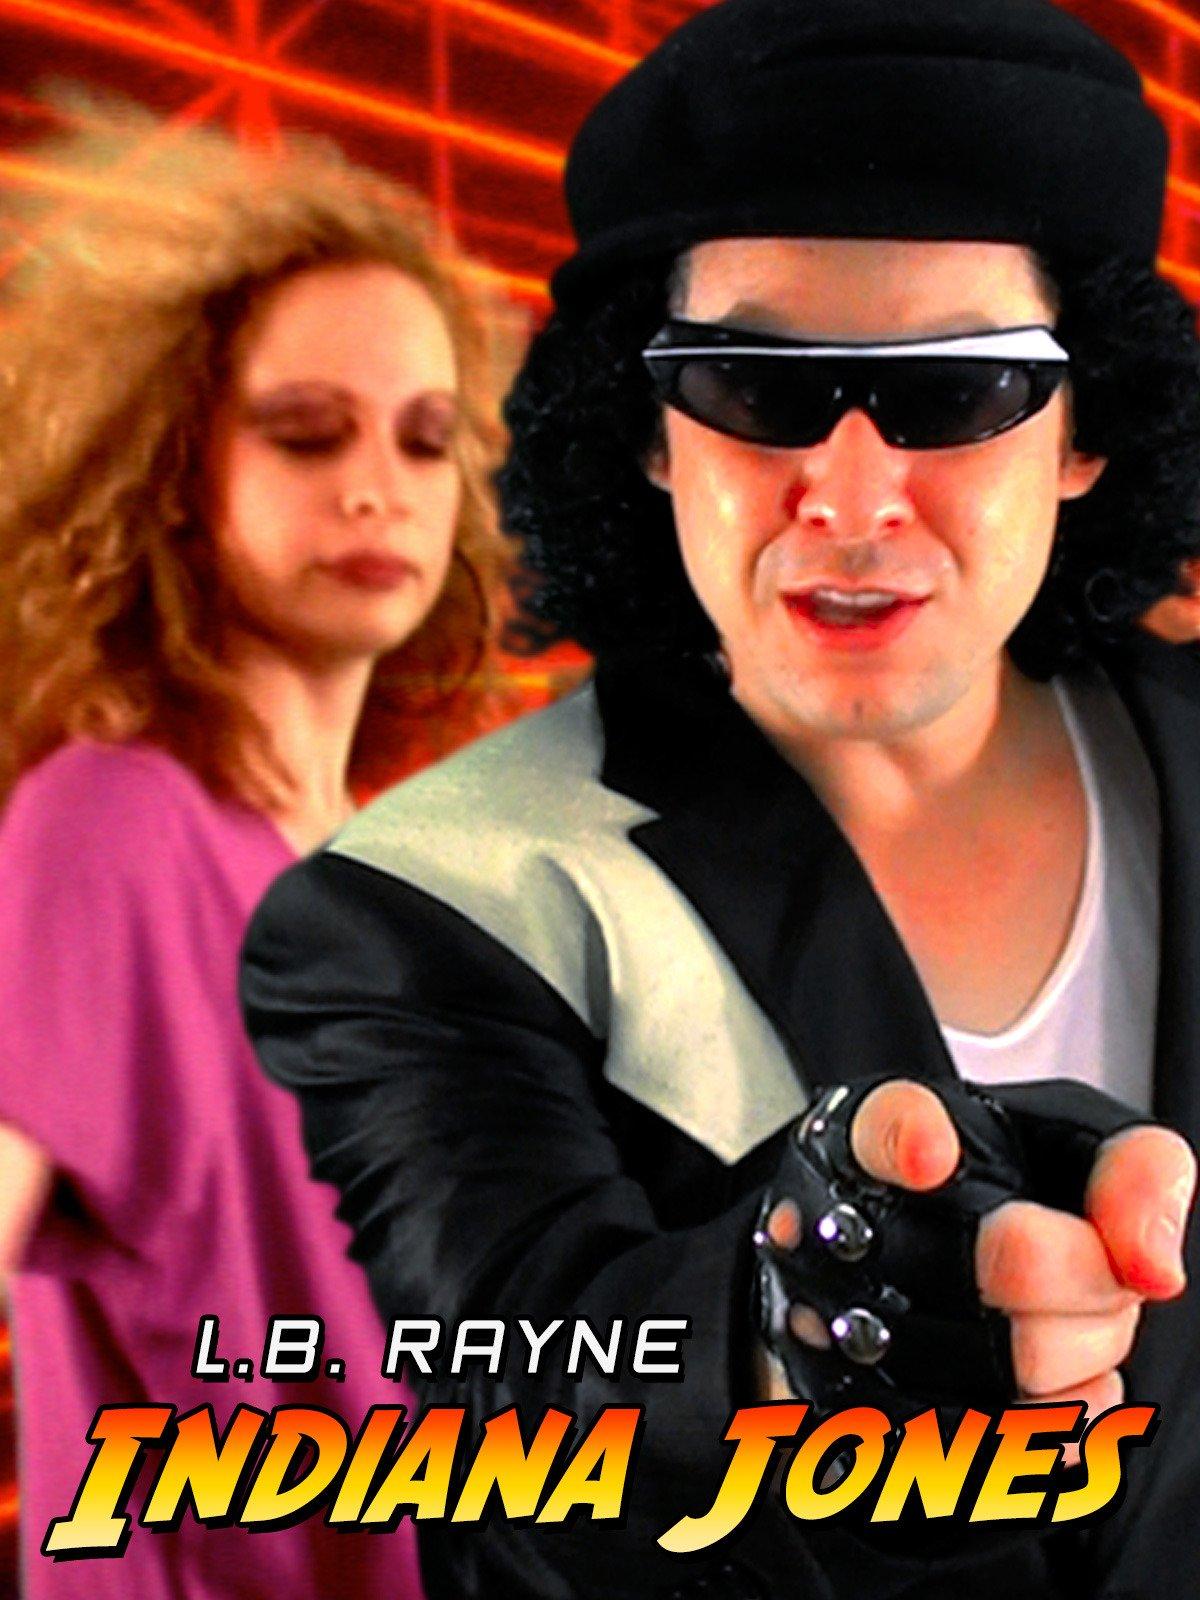 L.B. Rayne